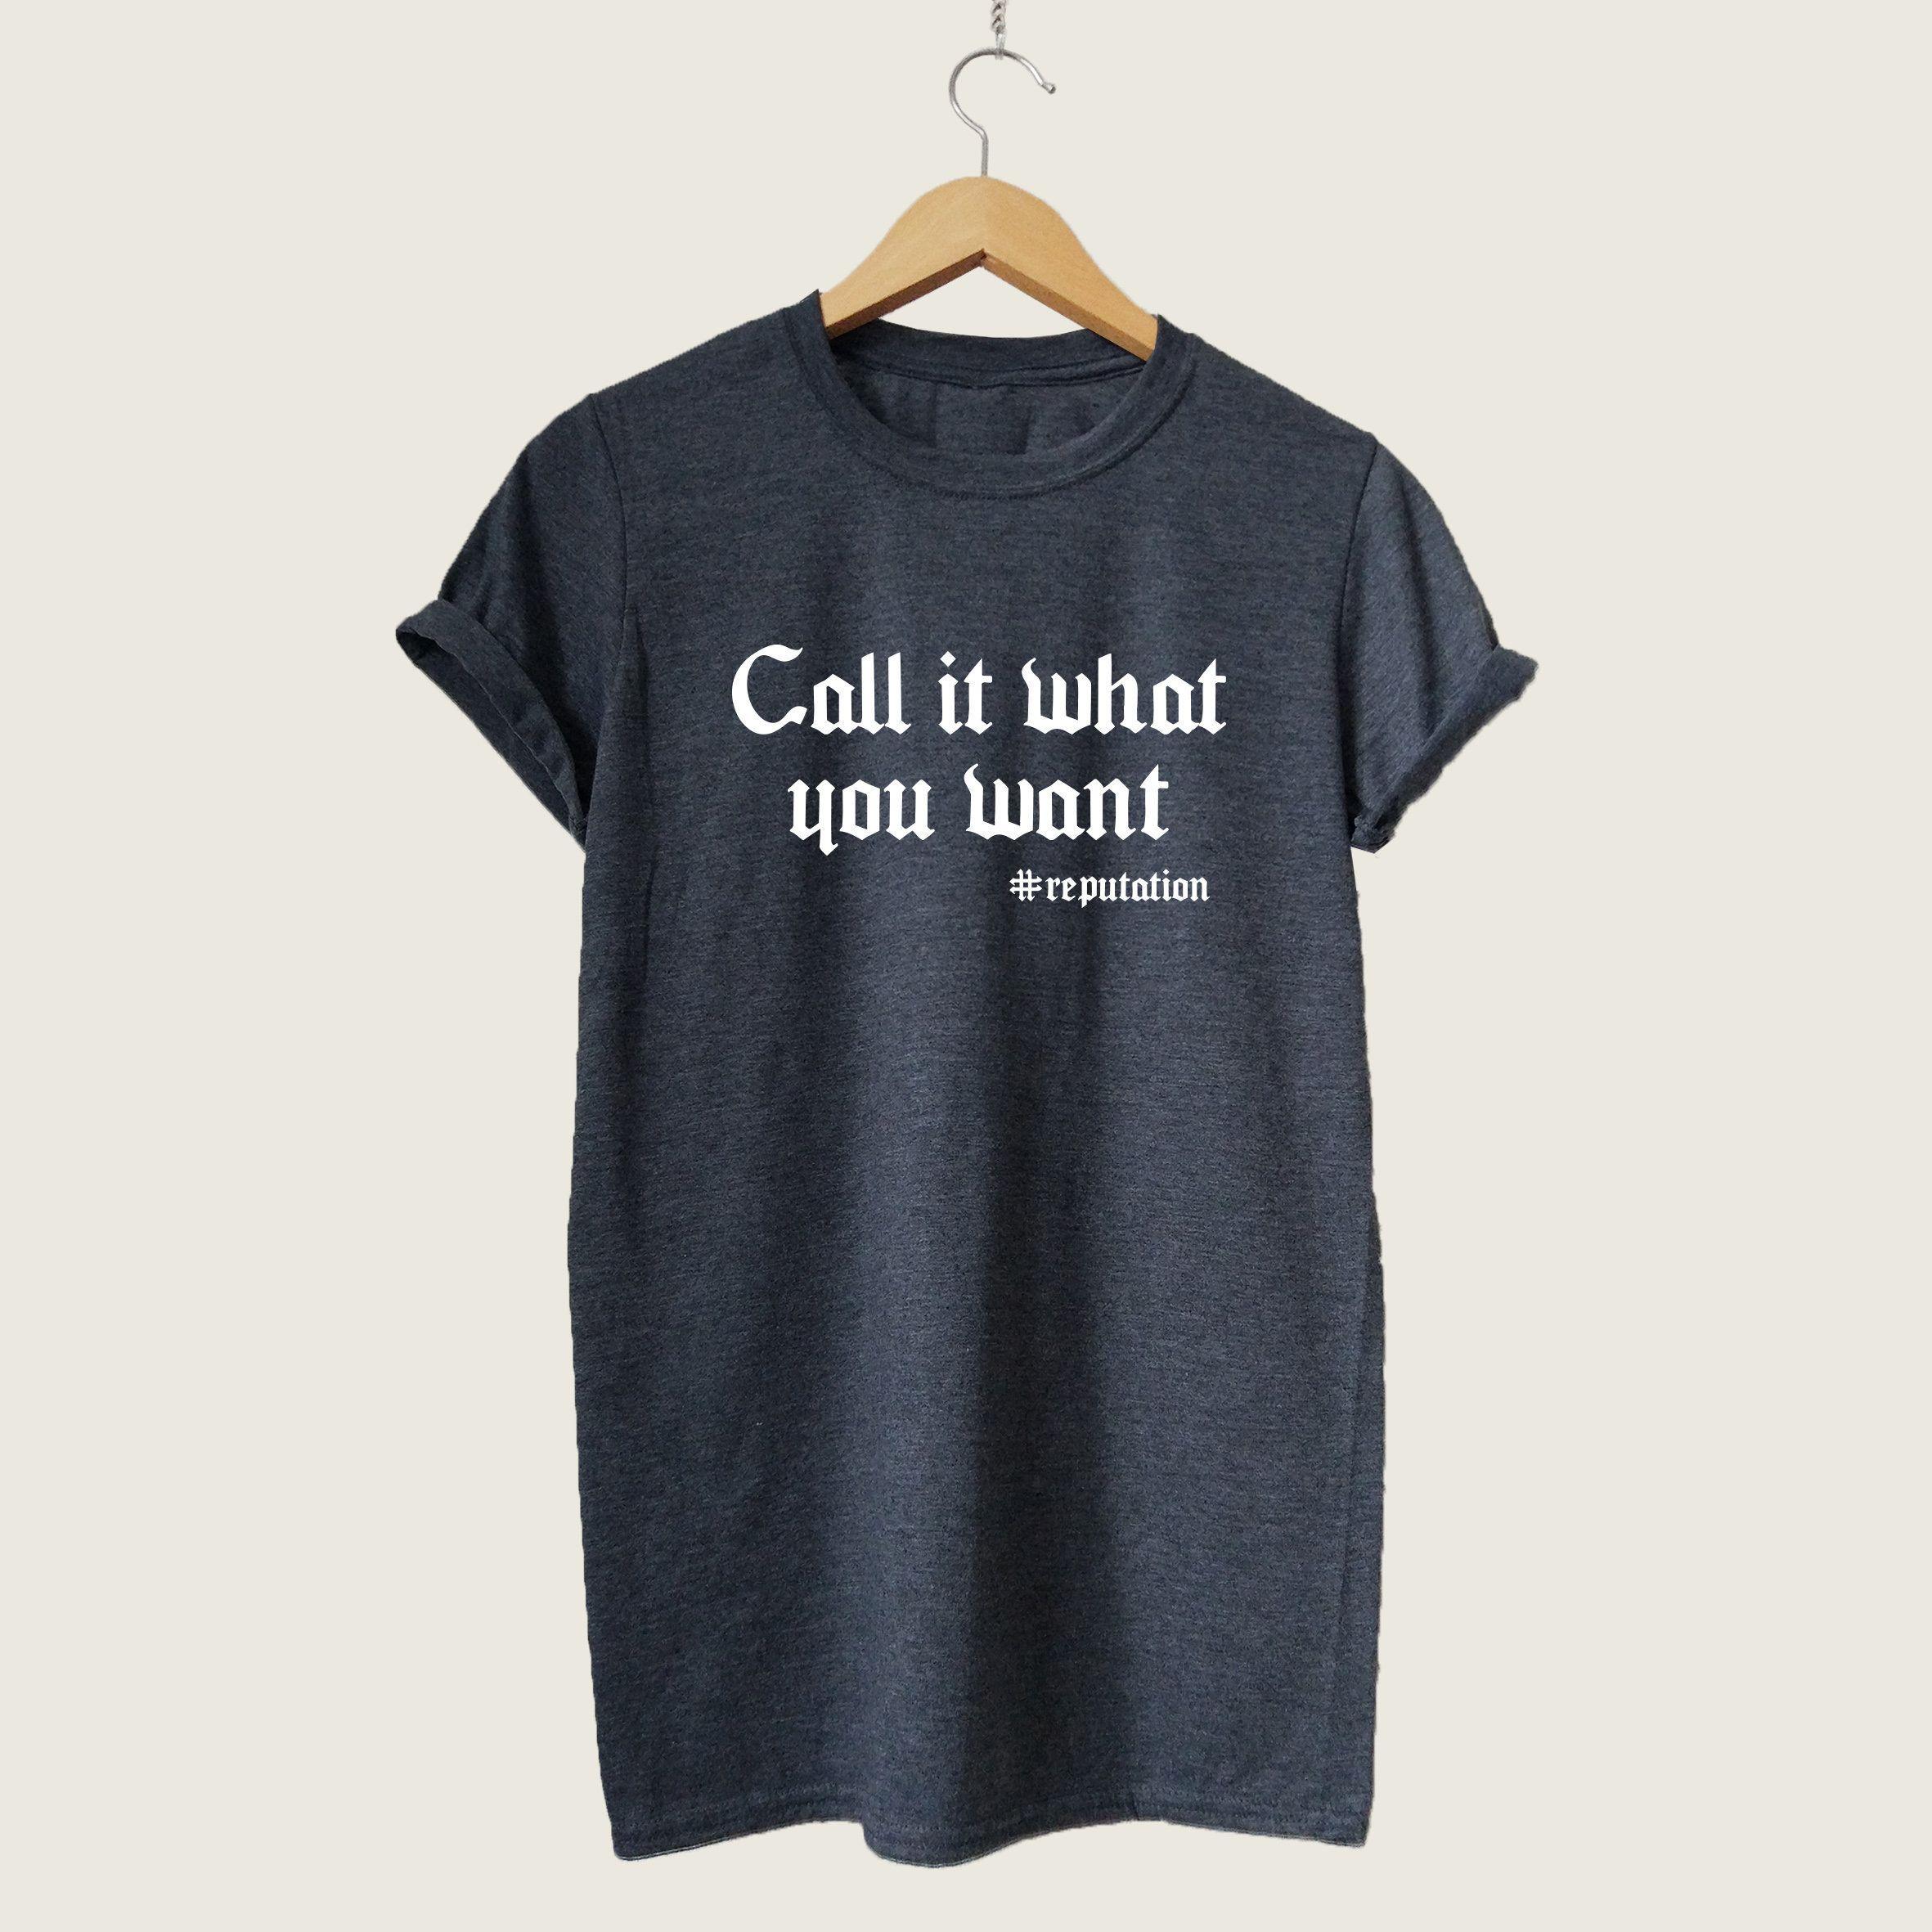 099ebb2d Call It What You Want T-shirt, Unisex Taylor Swift Swiftie Reputation Shirt